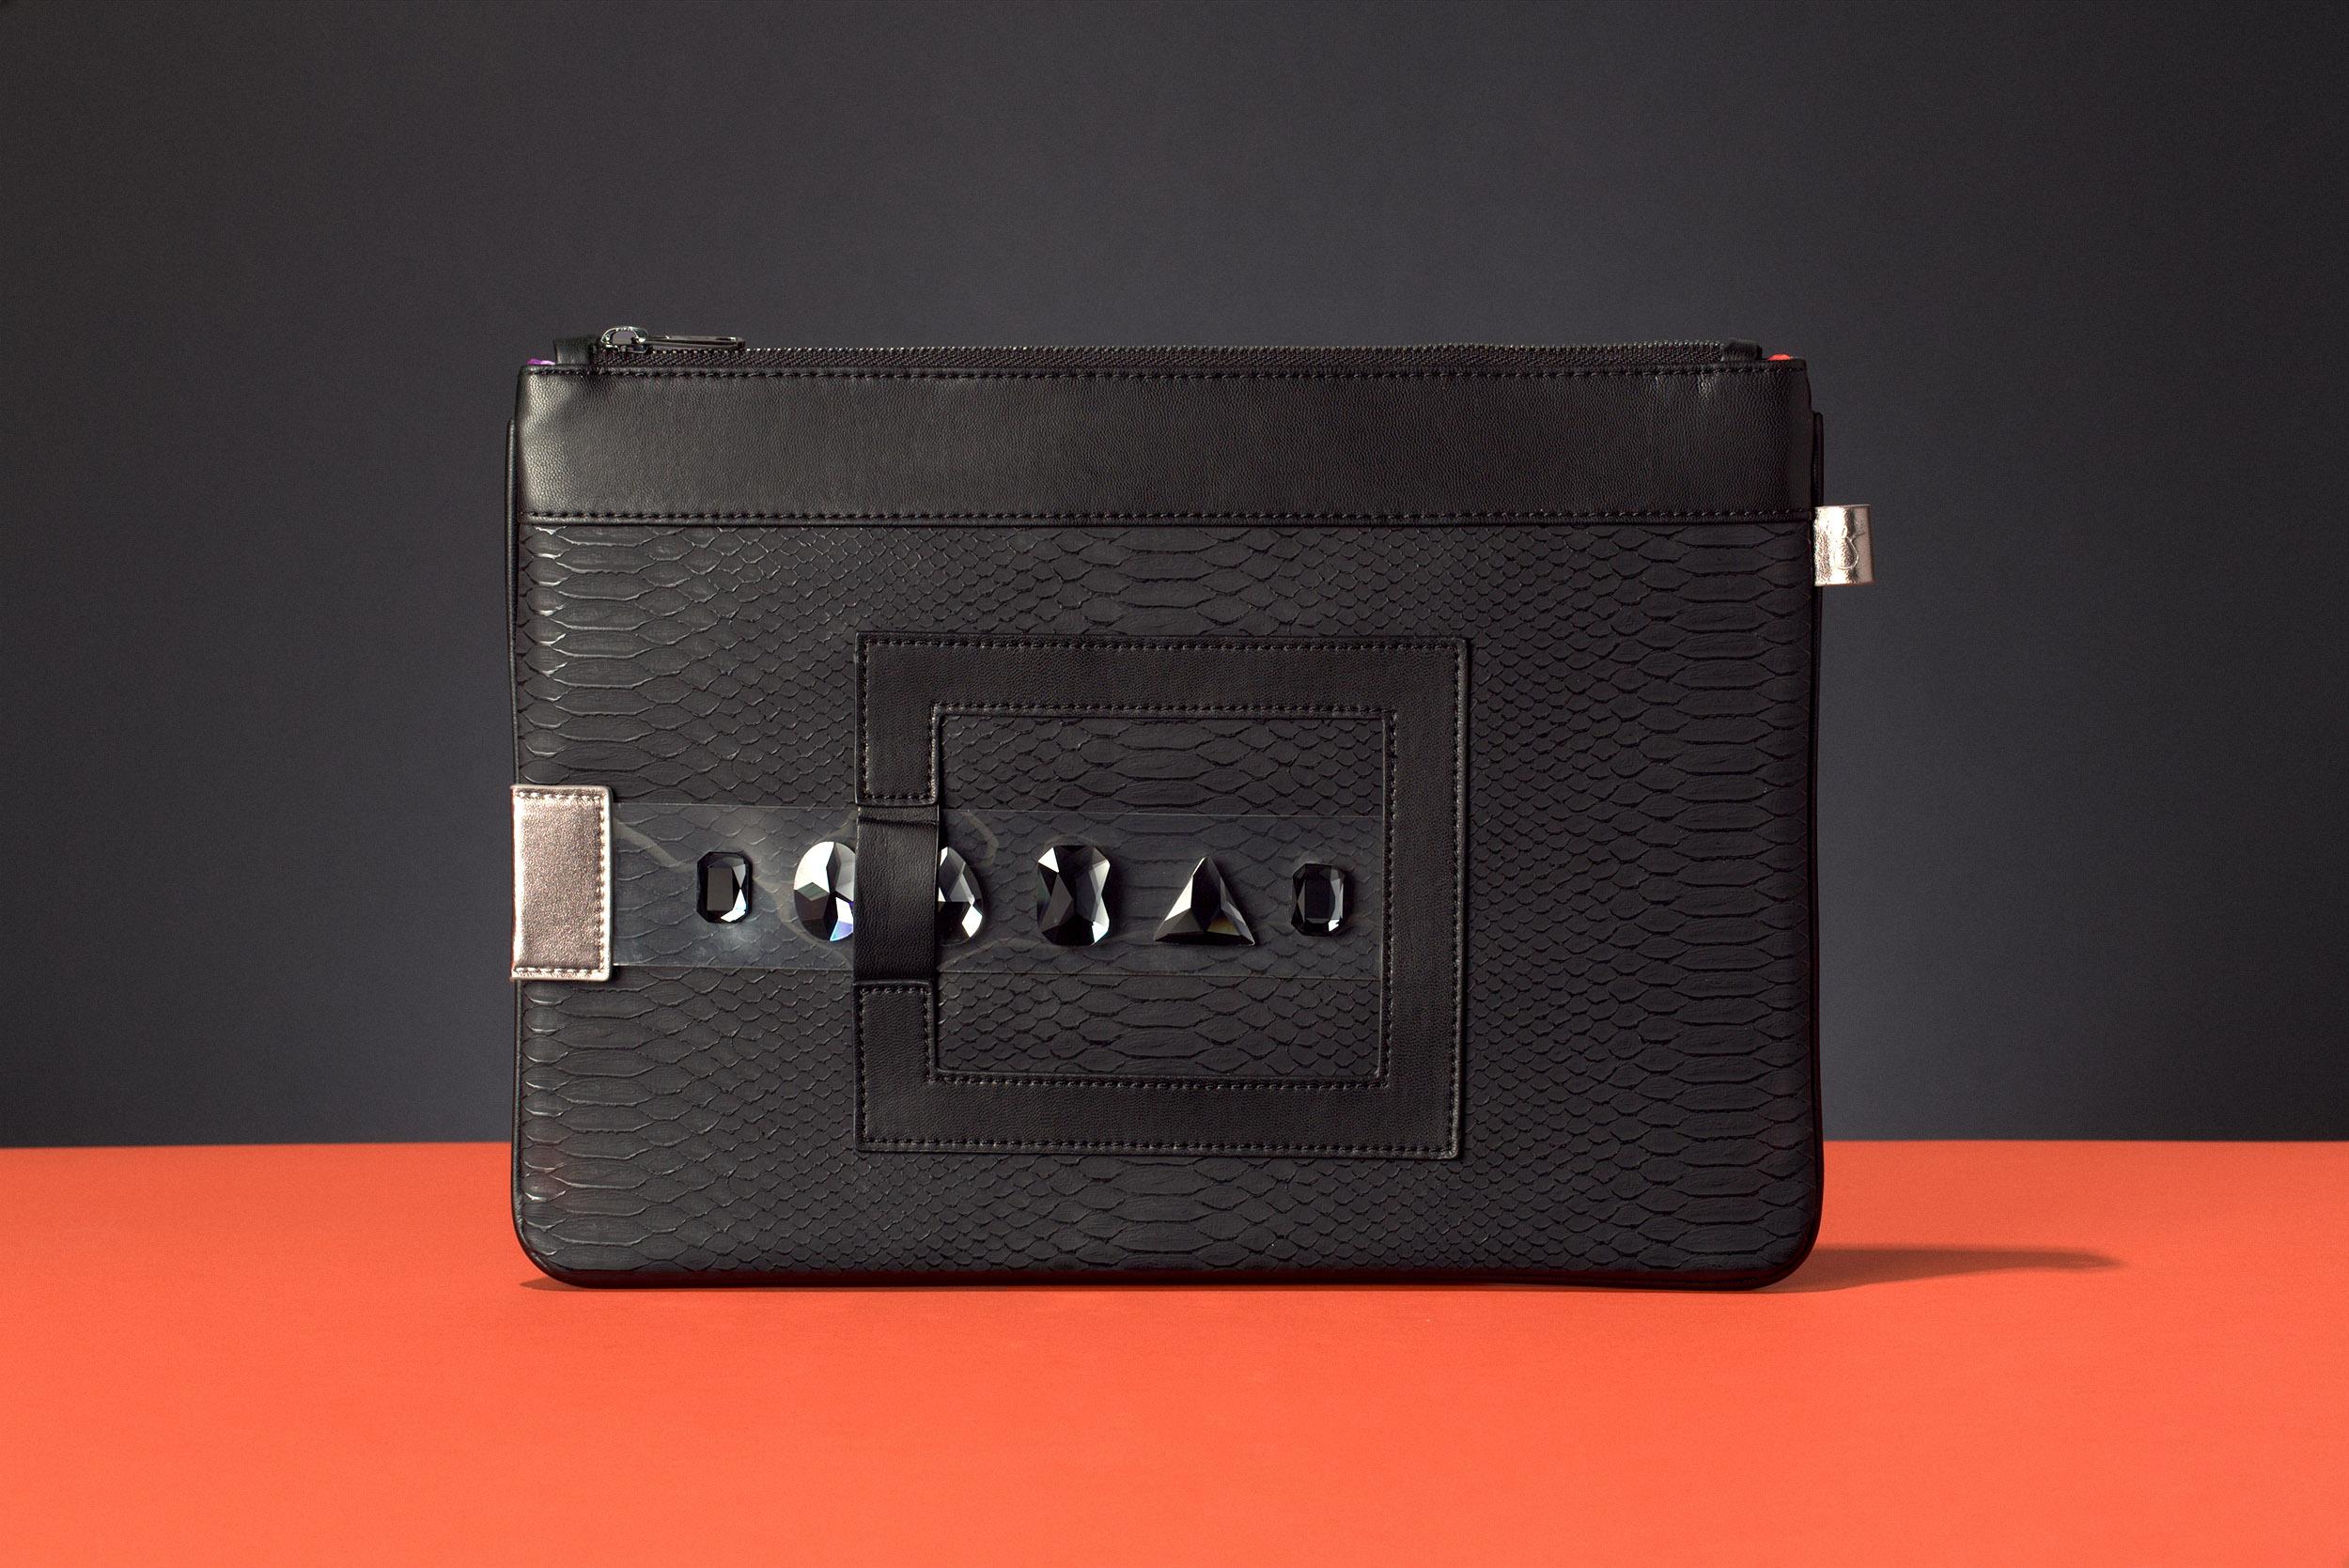 FruitenVeg-GEMA bag-never-leather-cruelty-free-vegan-leather-Ipad bag-black-large-bracelet clutch